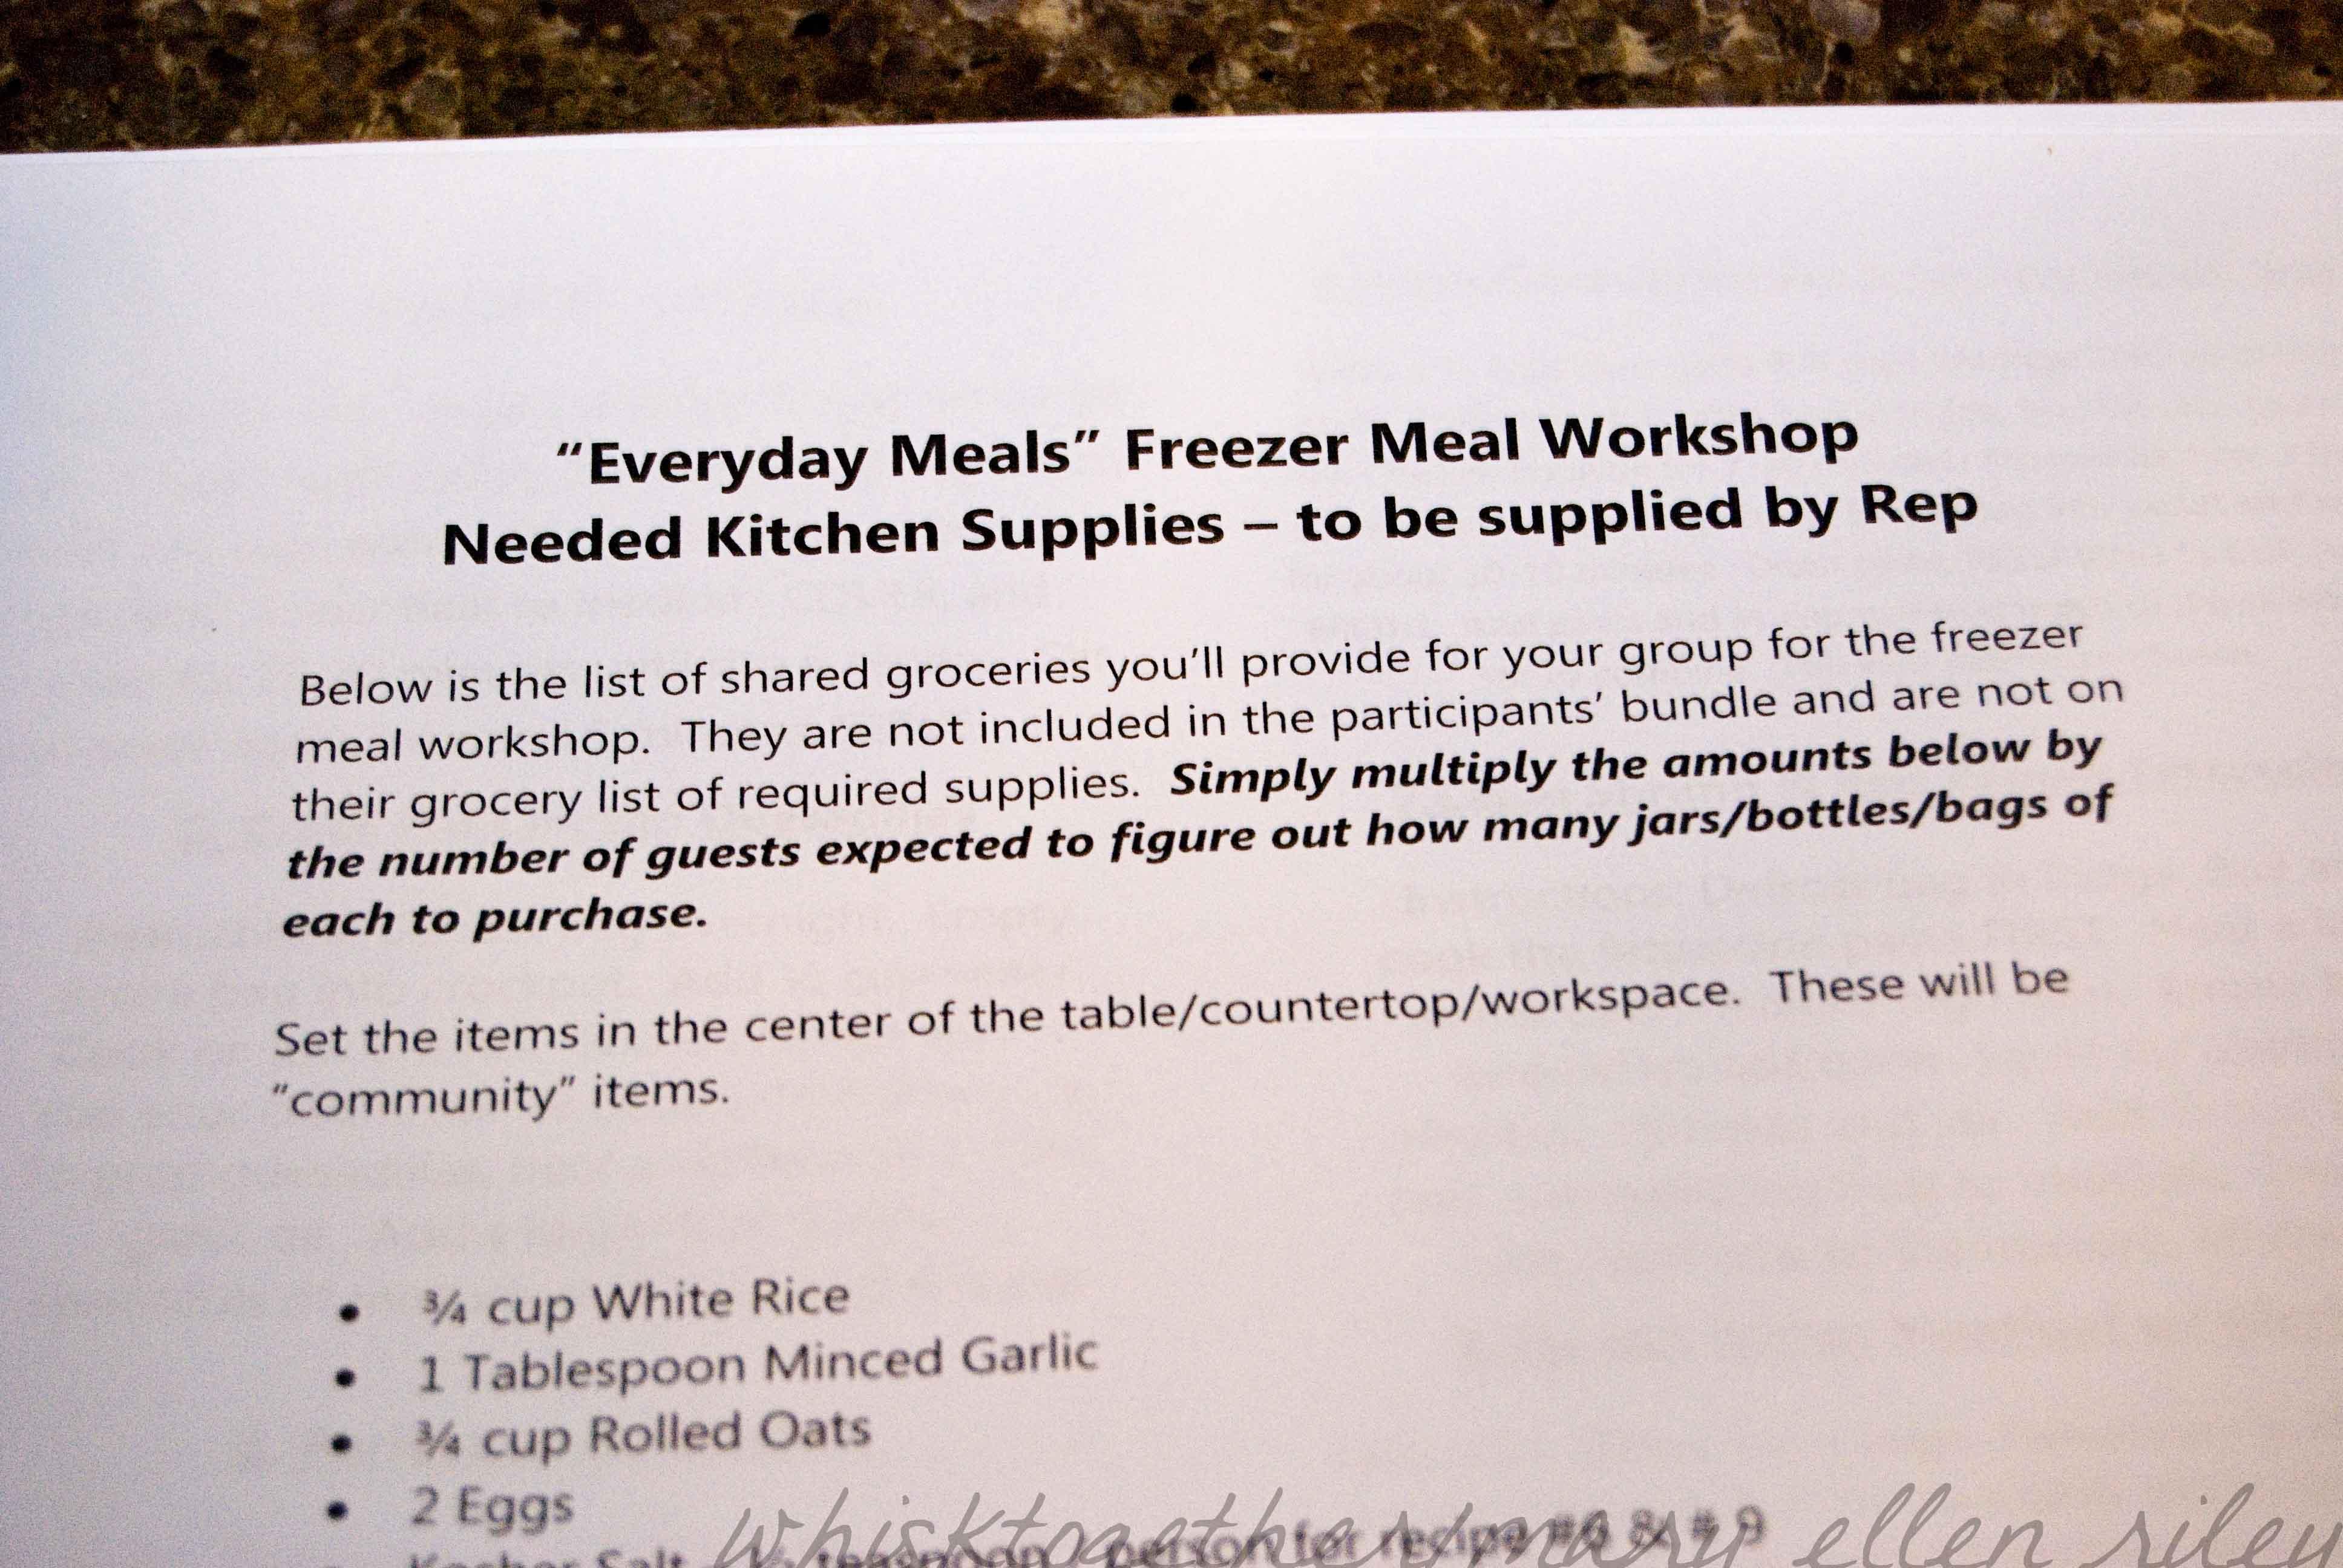 Wildtree Everyday Freezer Meal Workshop_2 on Whisk Together